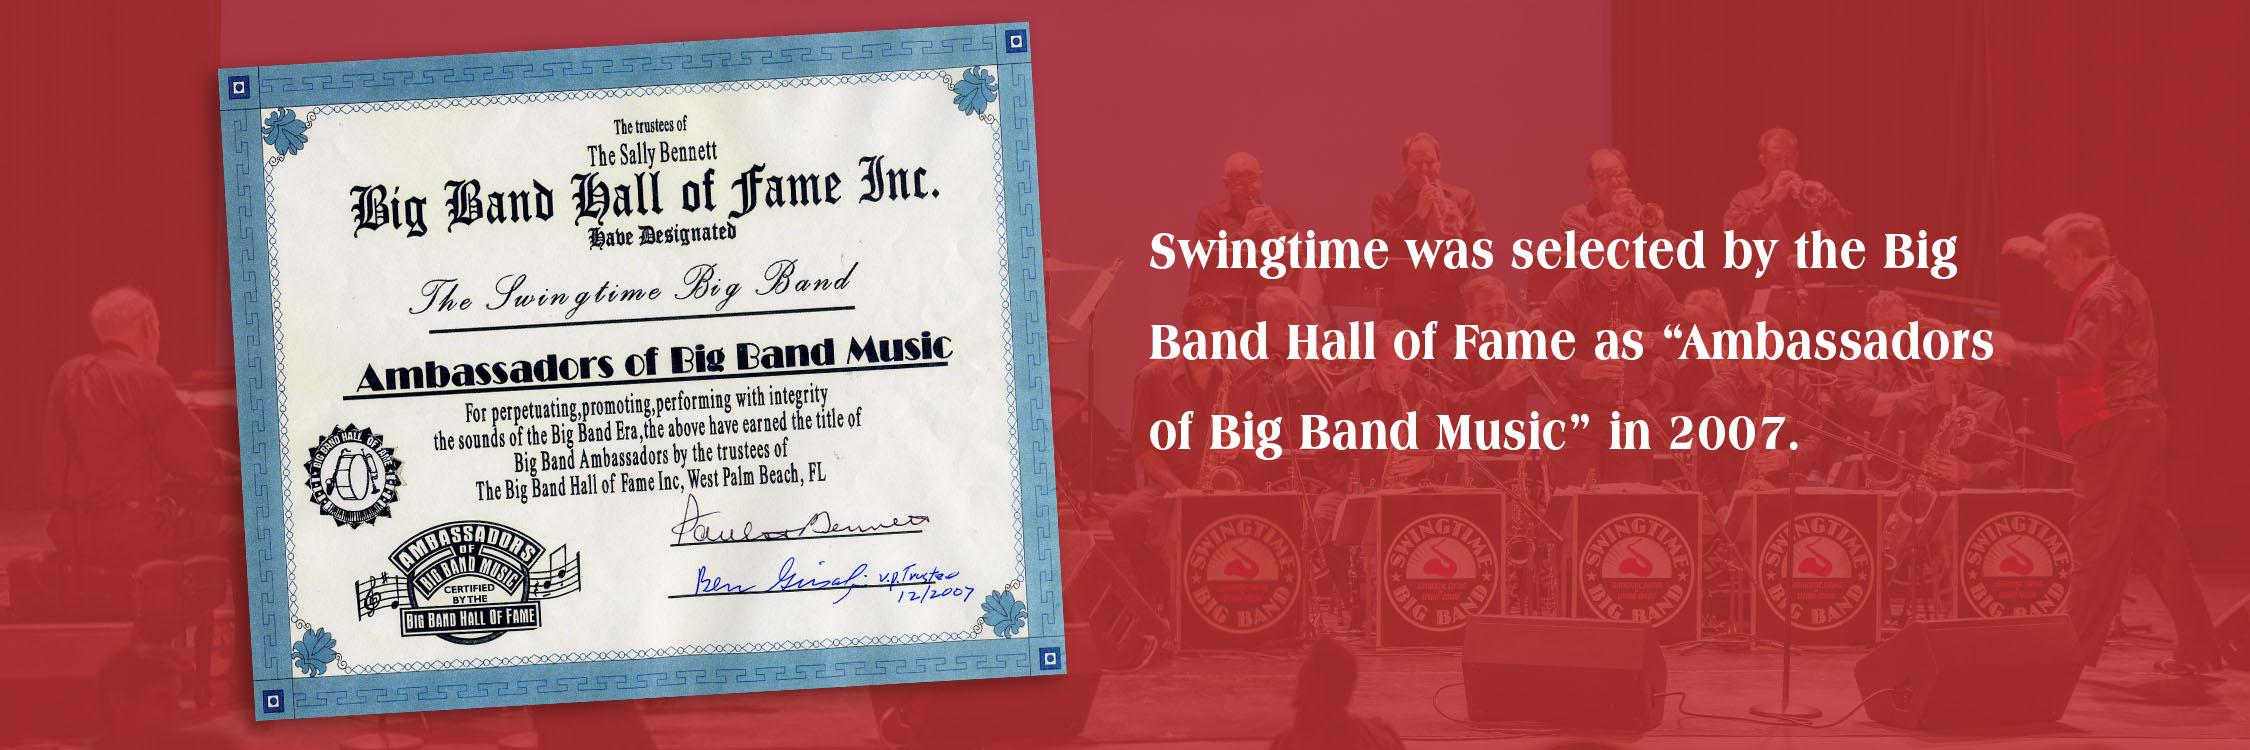 Ambassadors of Big Band Music certificate